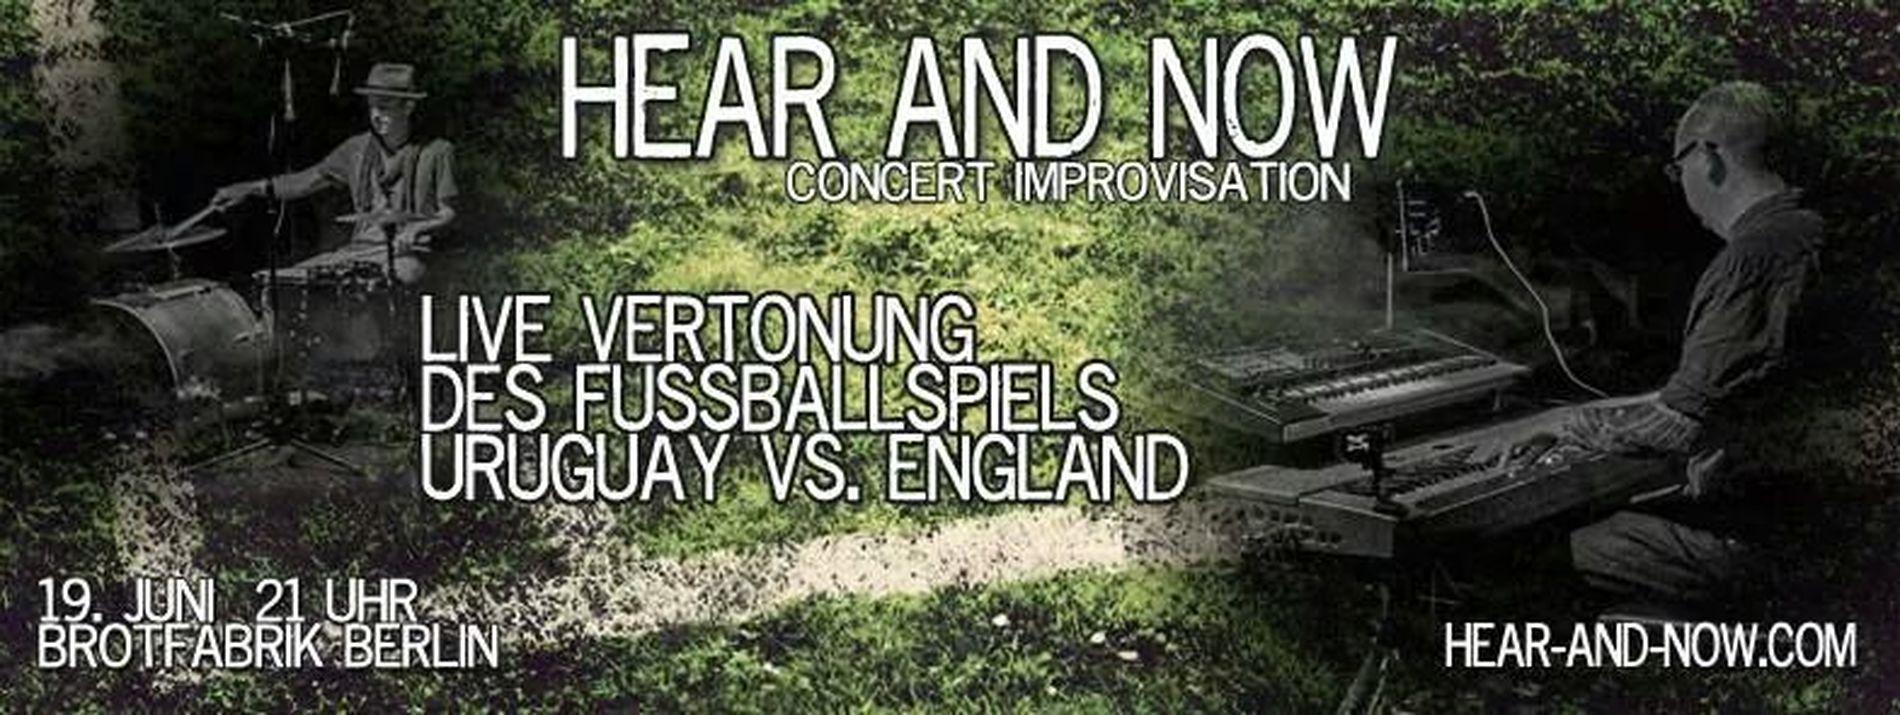 Tonight 9pm @Brotfabrik Berlin. Live Improv Soundtrack Uruguay vs England Concert Berlin Wm2014